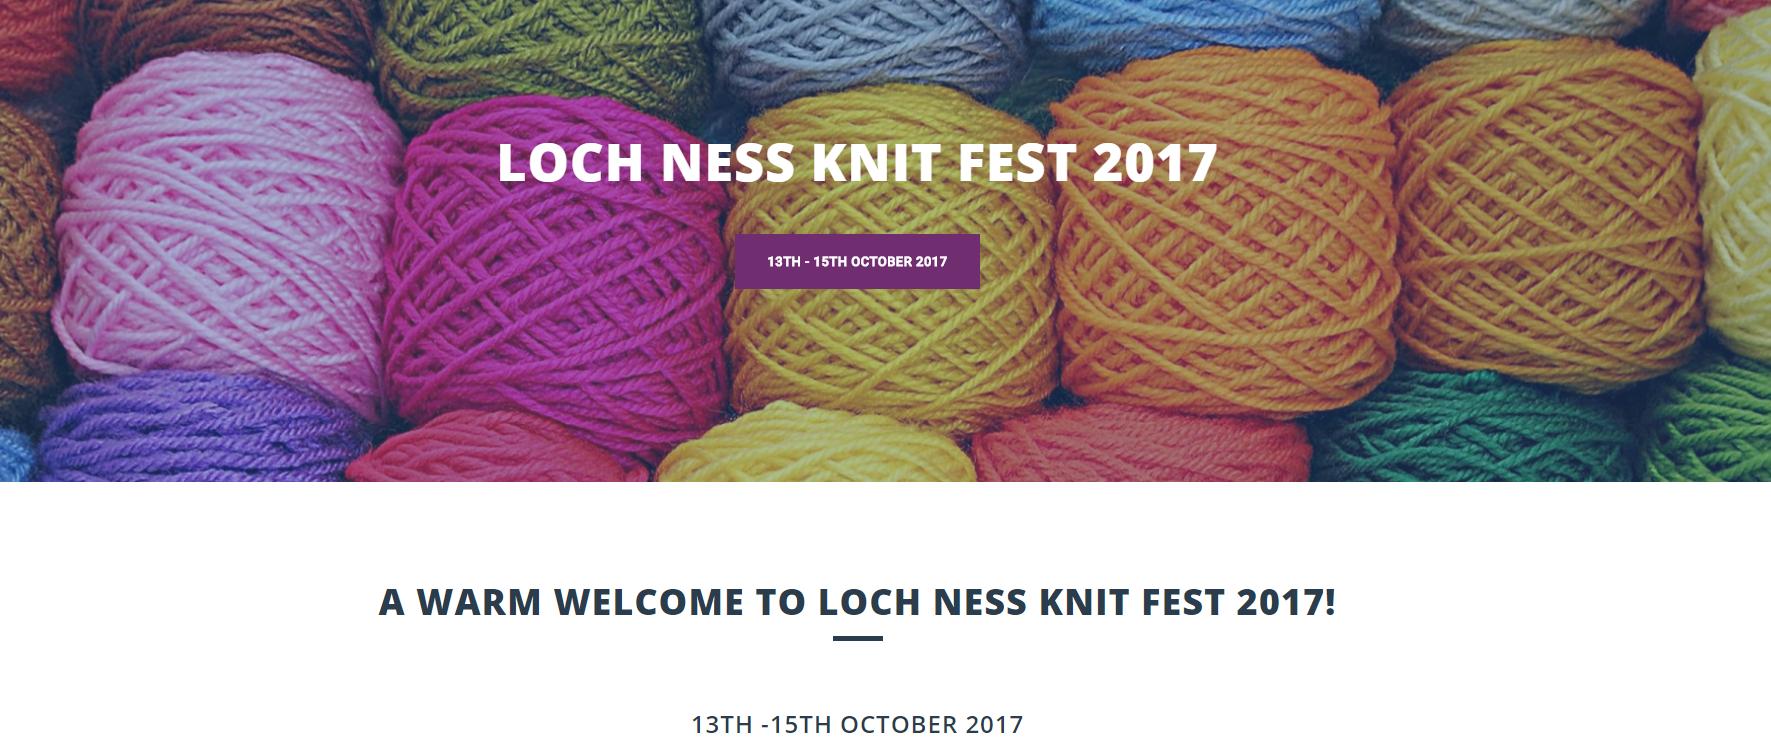 The Loch Ness Knit Fest